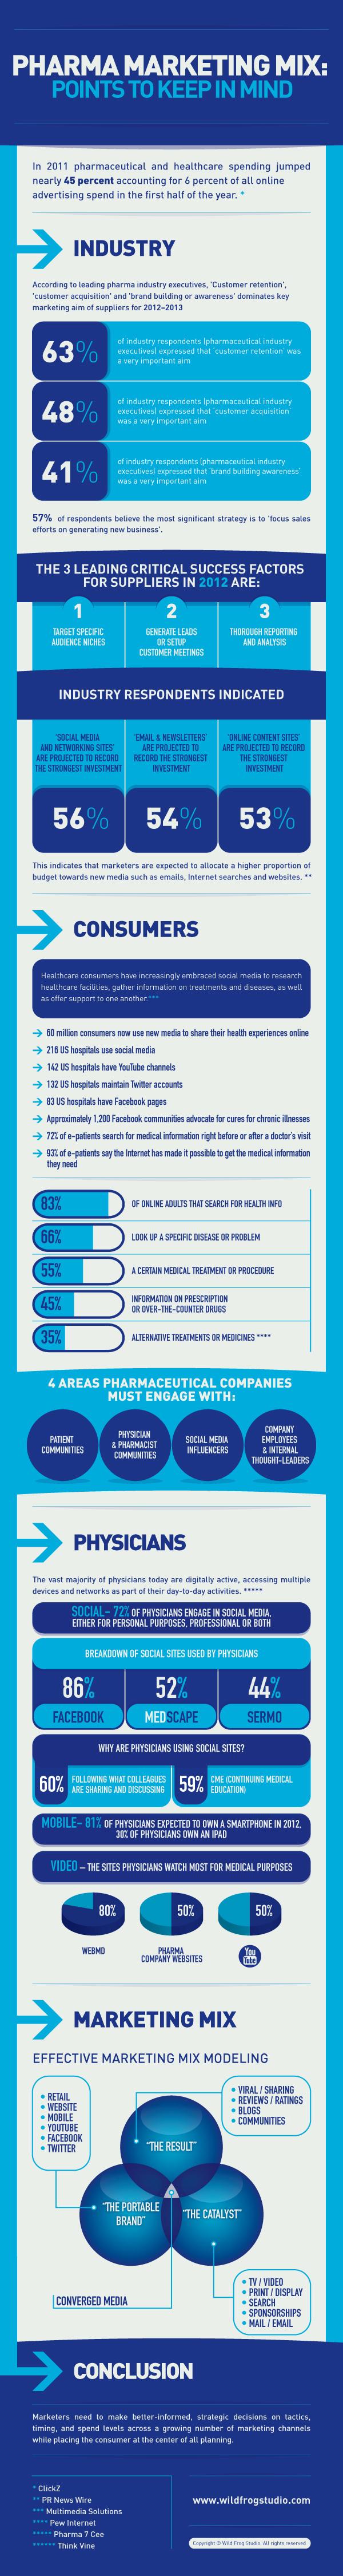 pharma-marketing-infographic